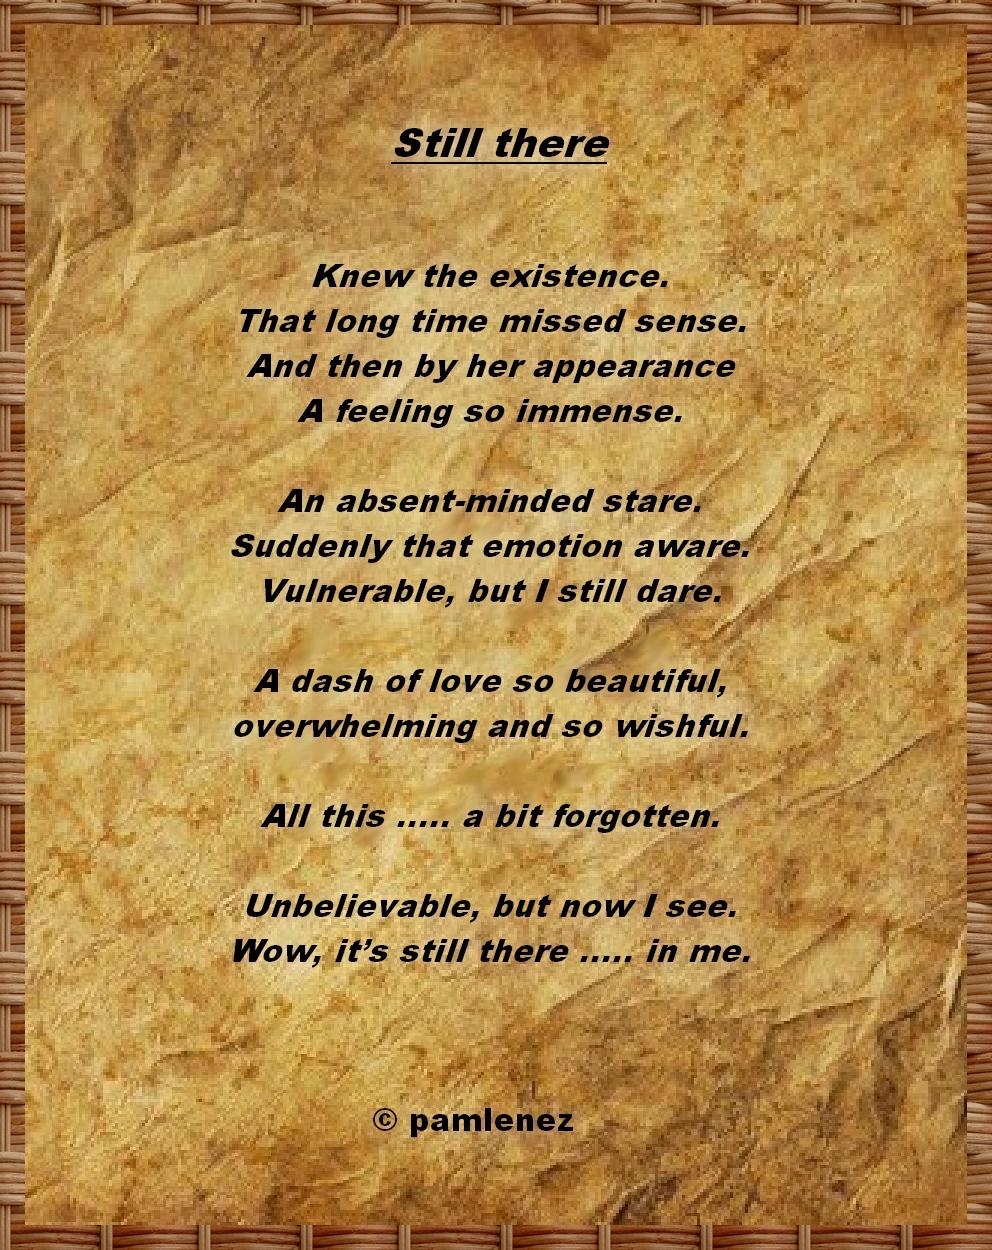 Pamlenez Gedichten